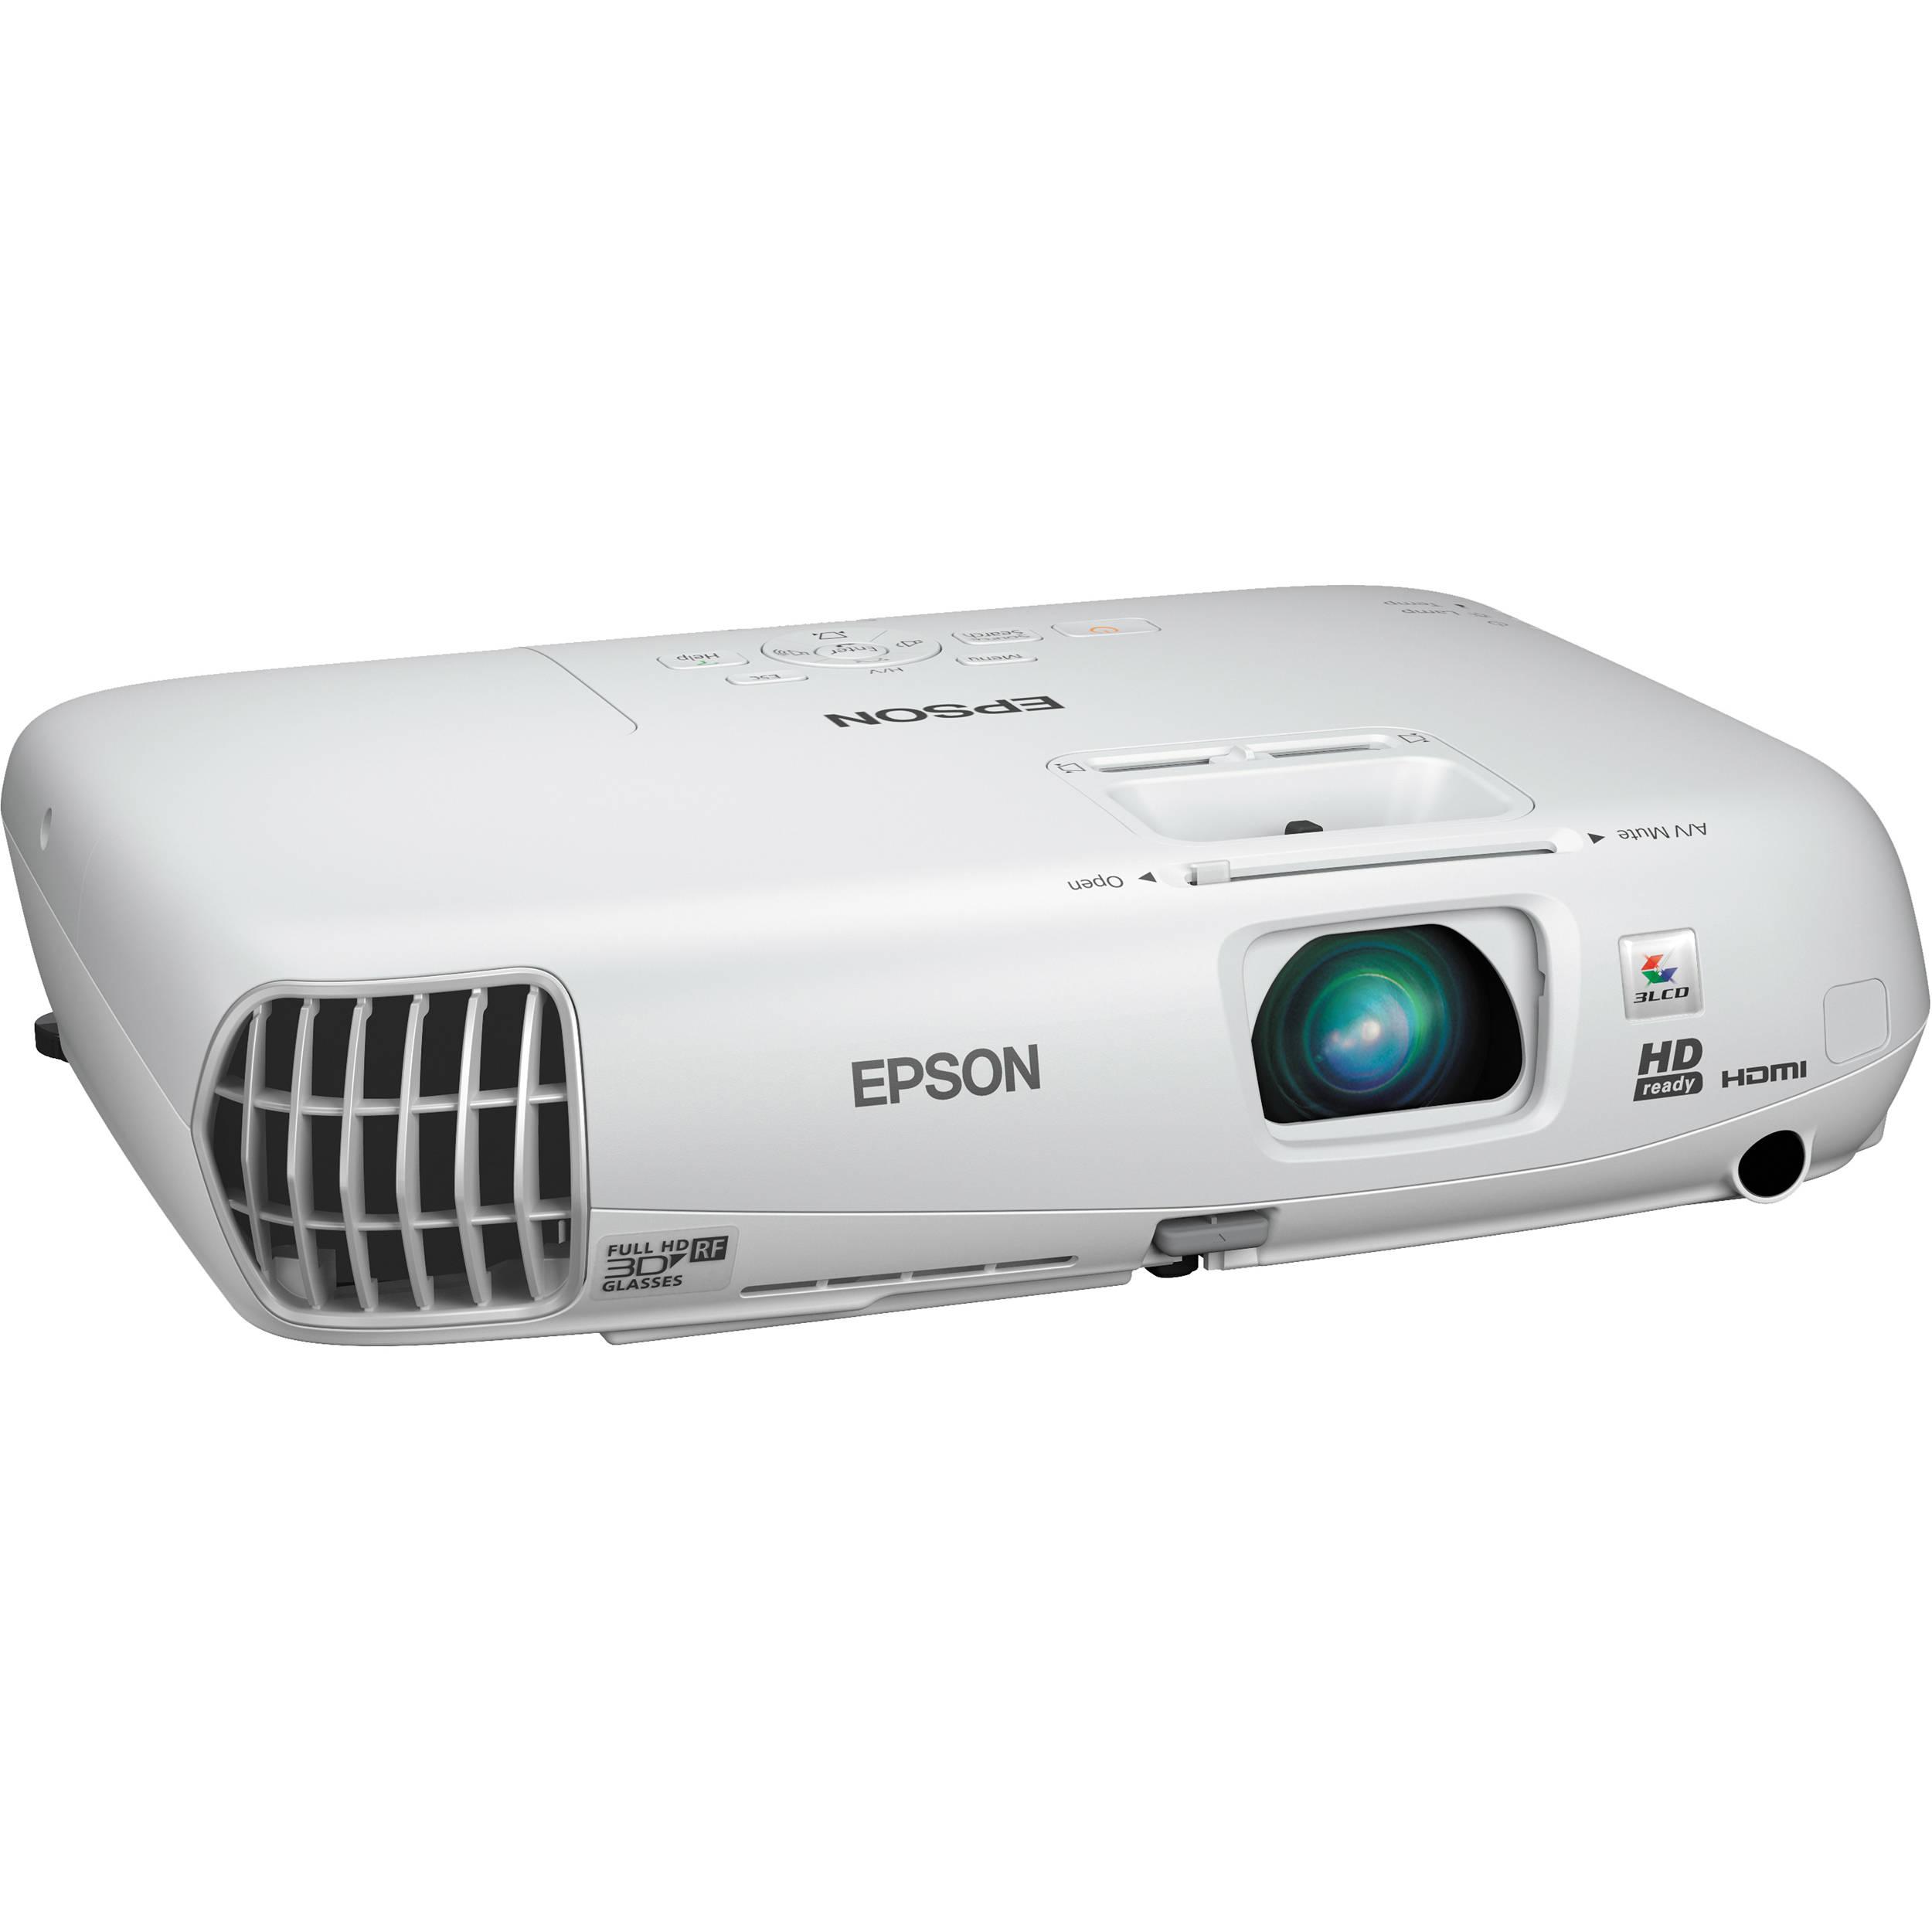 epson powerlite home cinema 750hd 720p 3lcd projector v11h499020 rh bhphotovideo com epson powerlite 710hd manual Epson L380 Manual